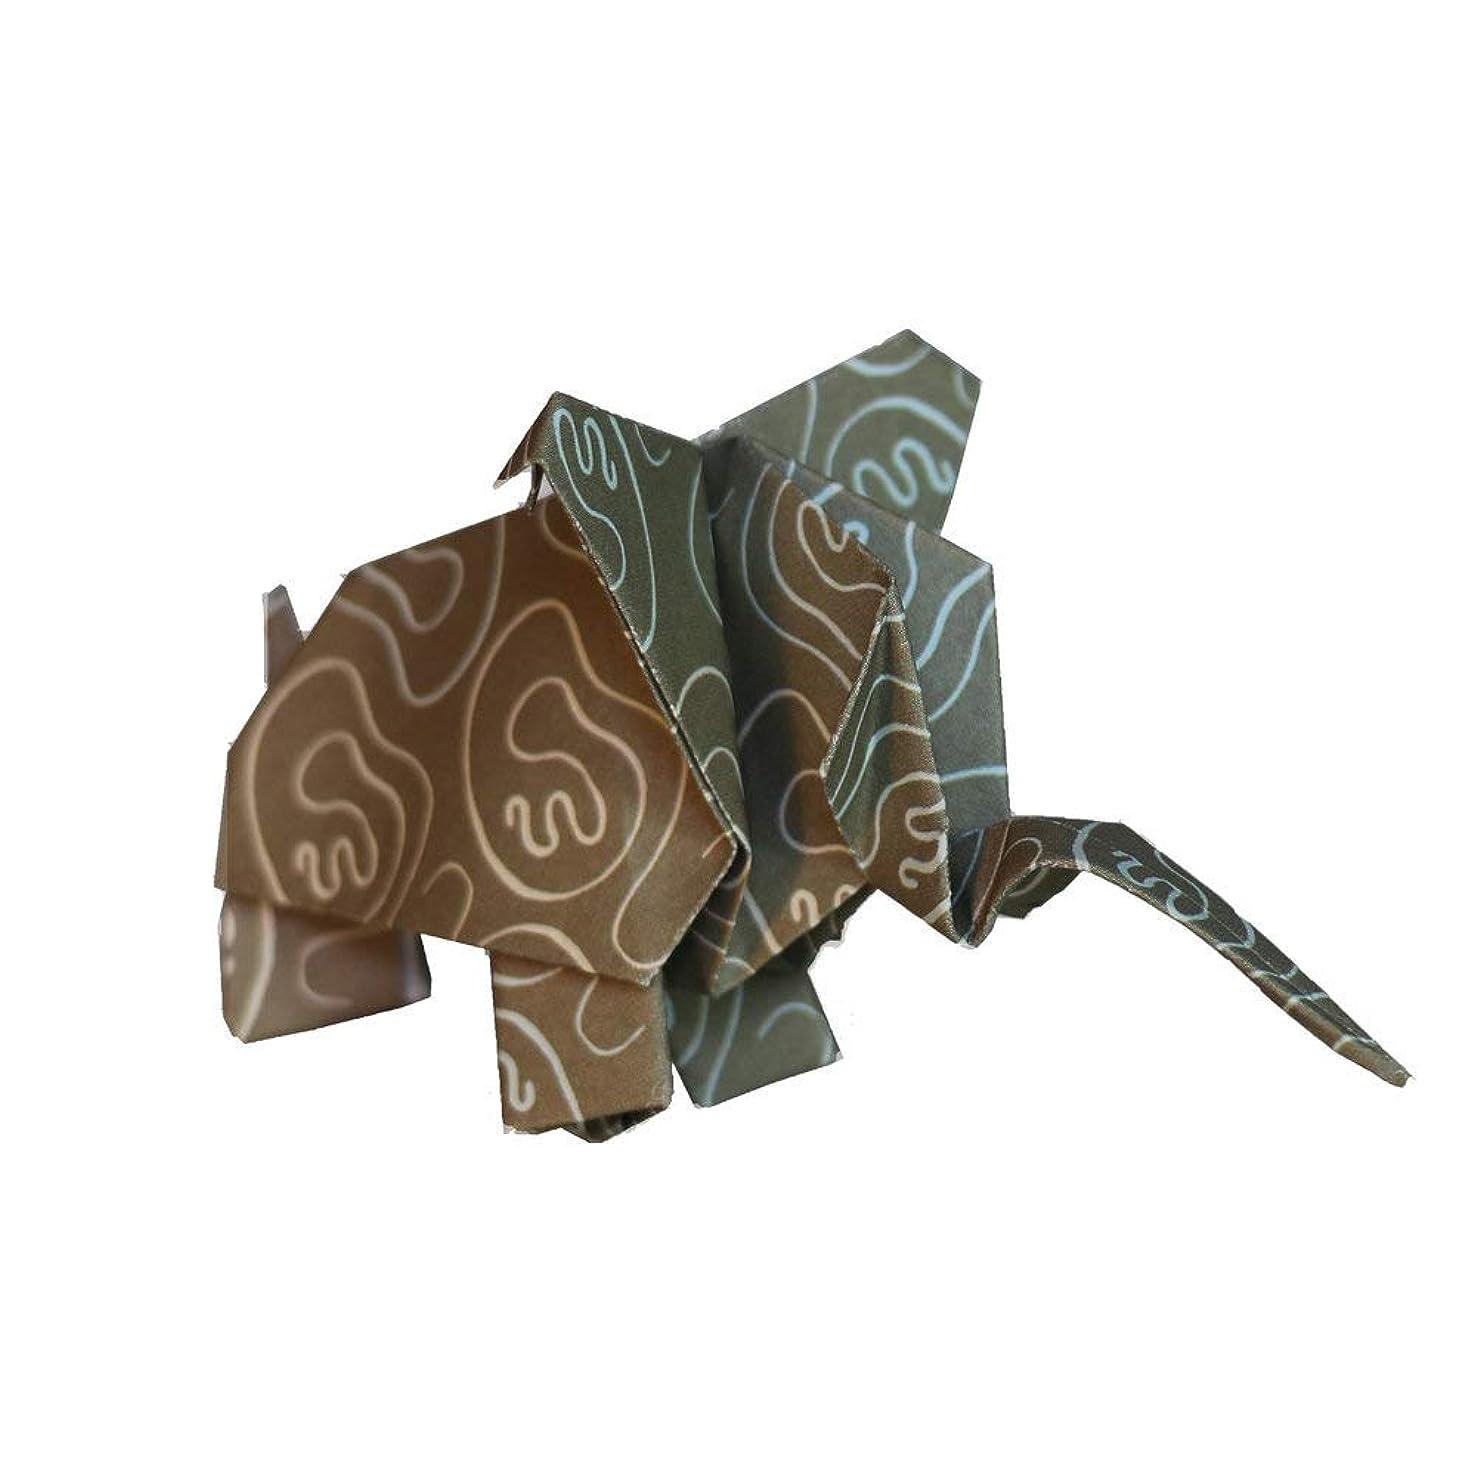 Origami Animal Modelling Kit LARGE   24 Animal Models   200 Sheets Origami Paper